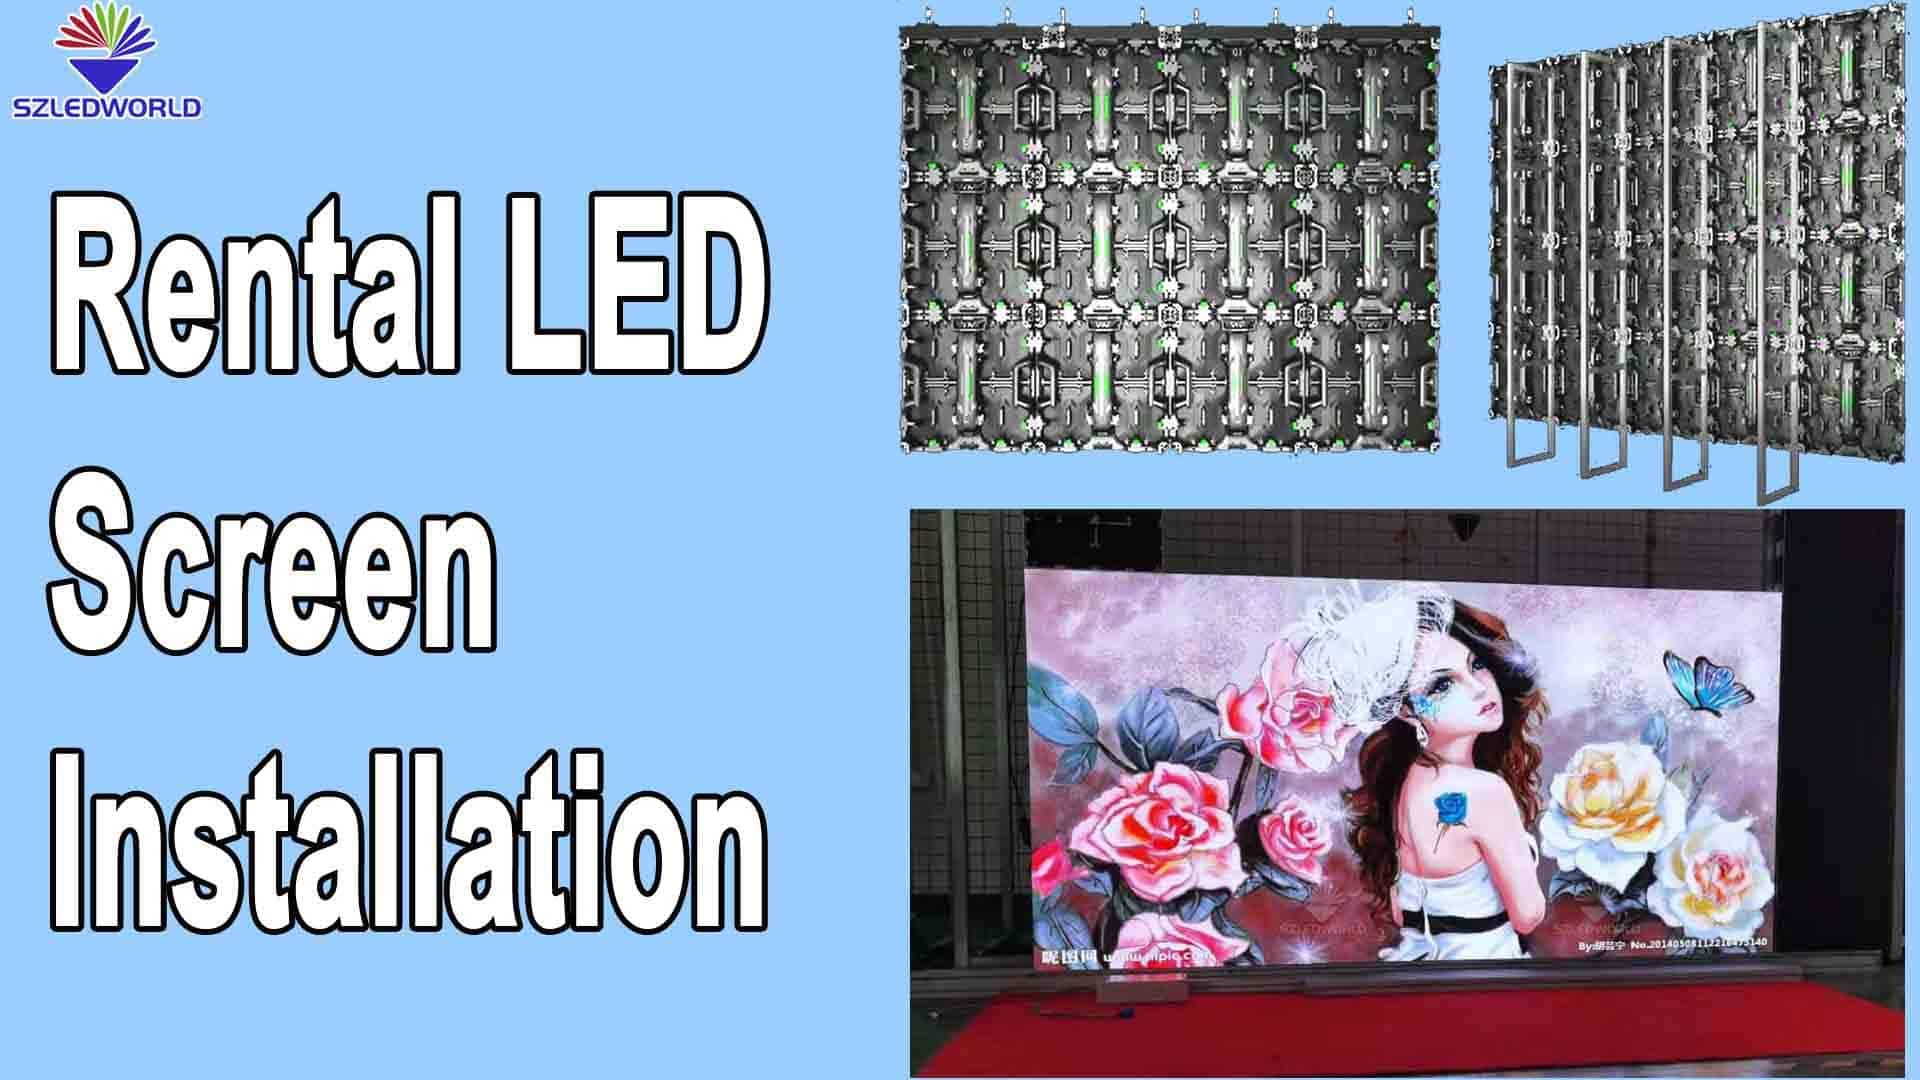 Rental LED Screen installation